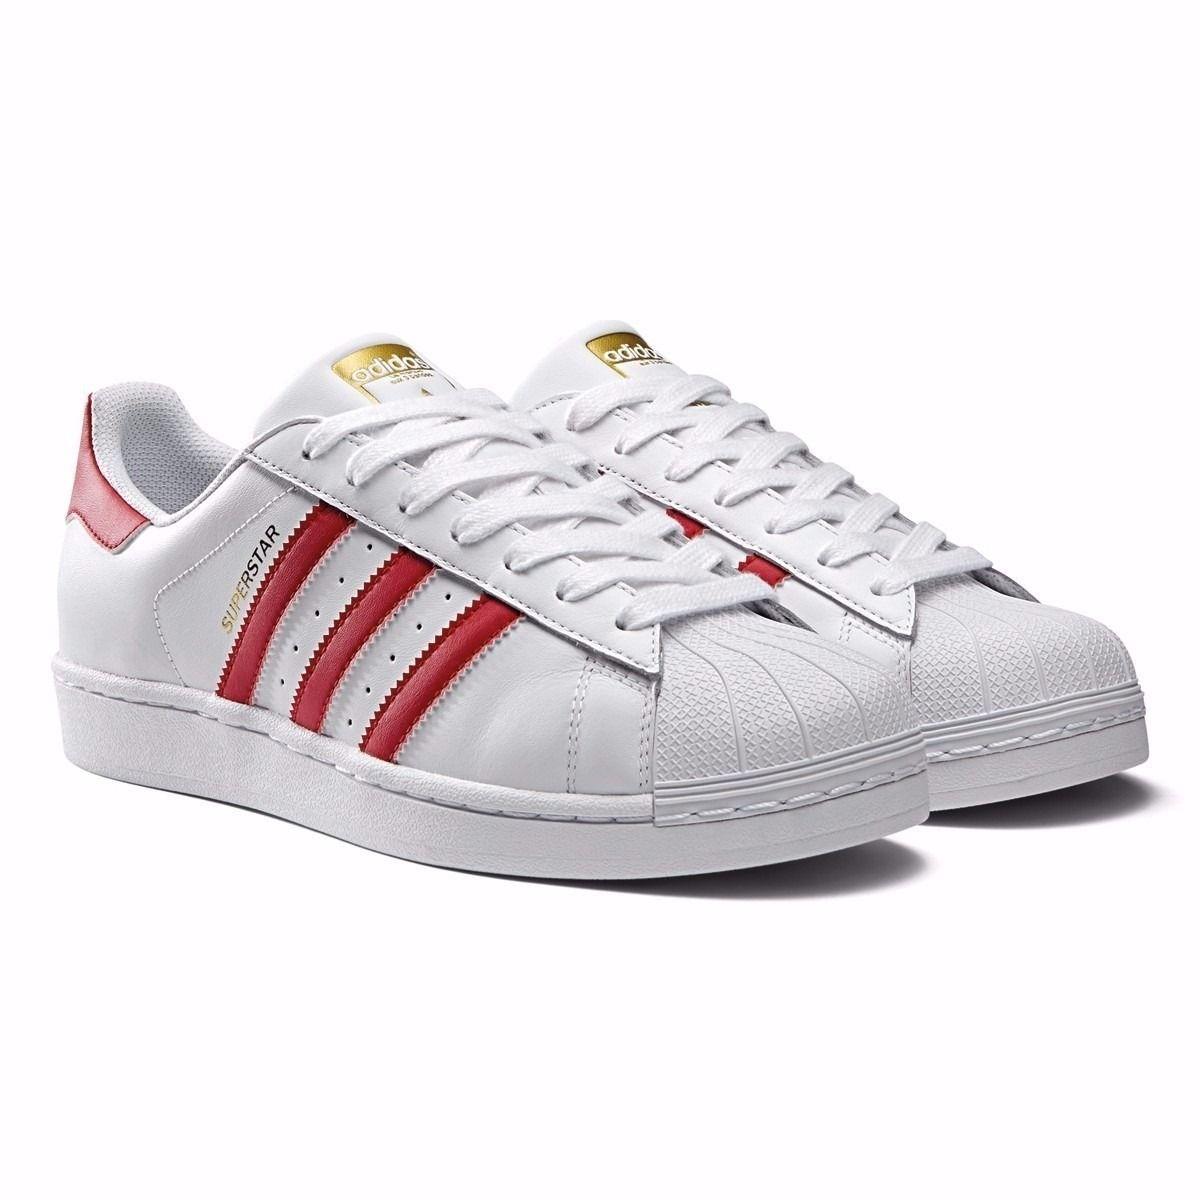 Adidas SuperStar